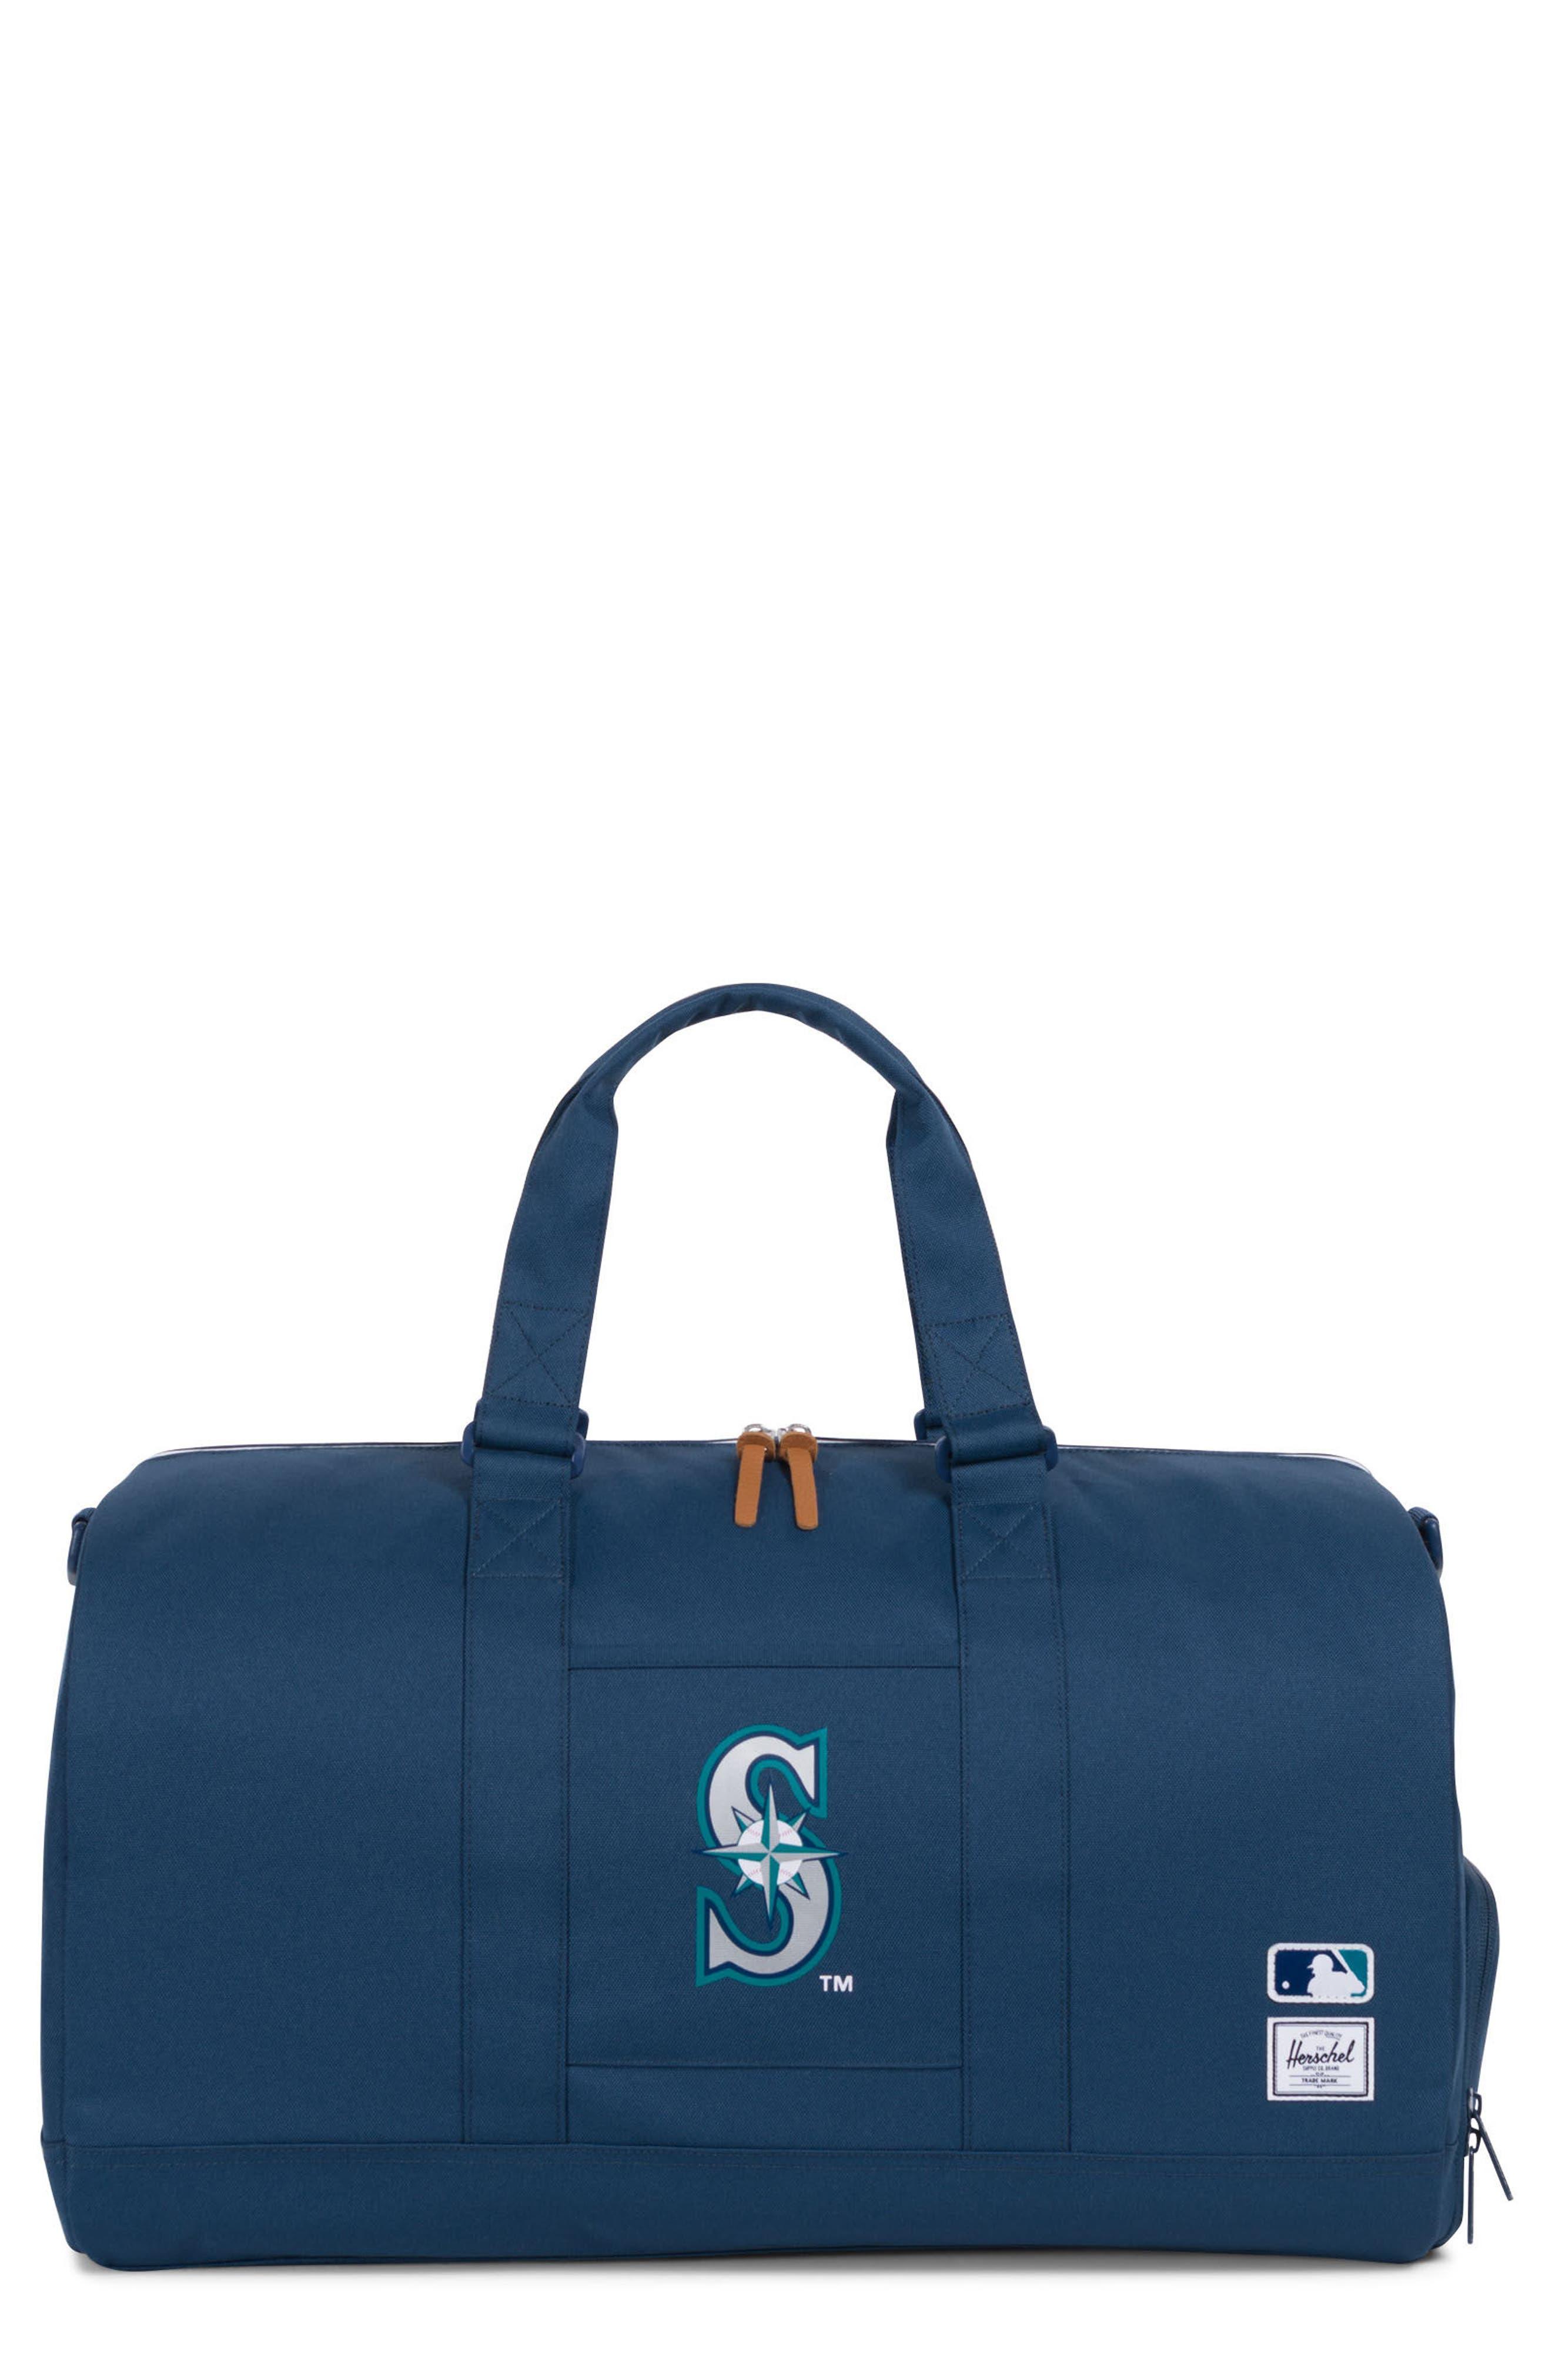 Novel - MLB American League Duffel Bag,                             Main thumbnail 1, color,                             SEATTLE MARINERS